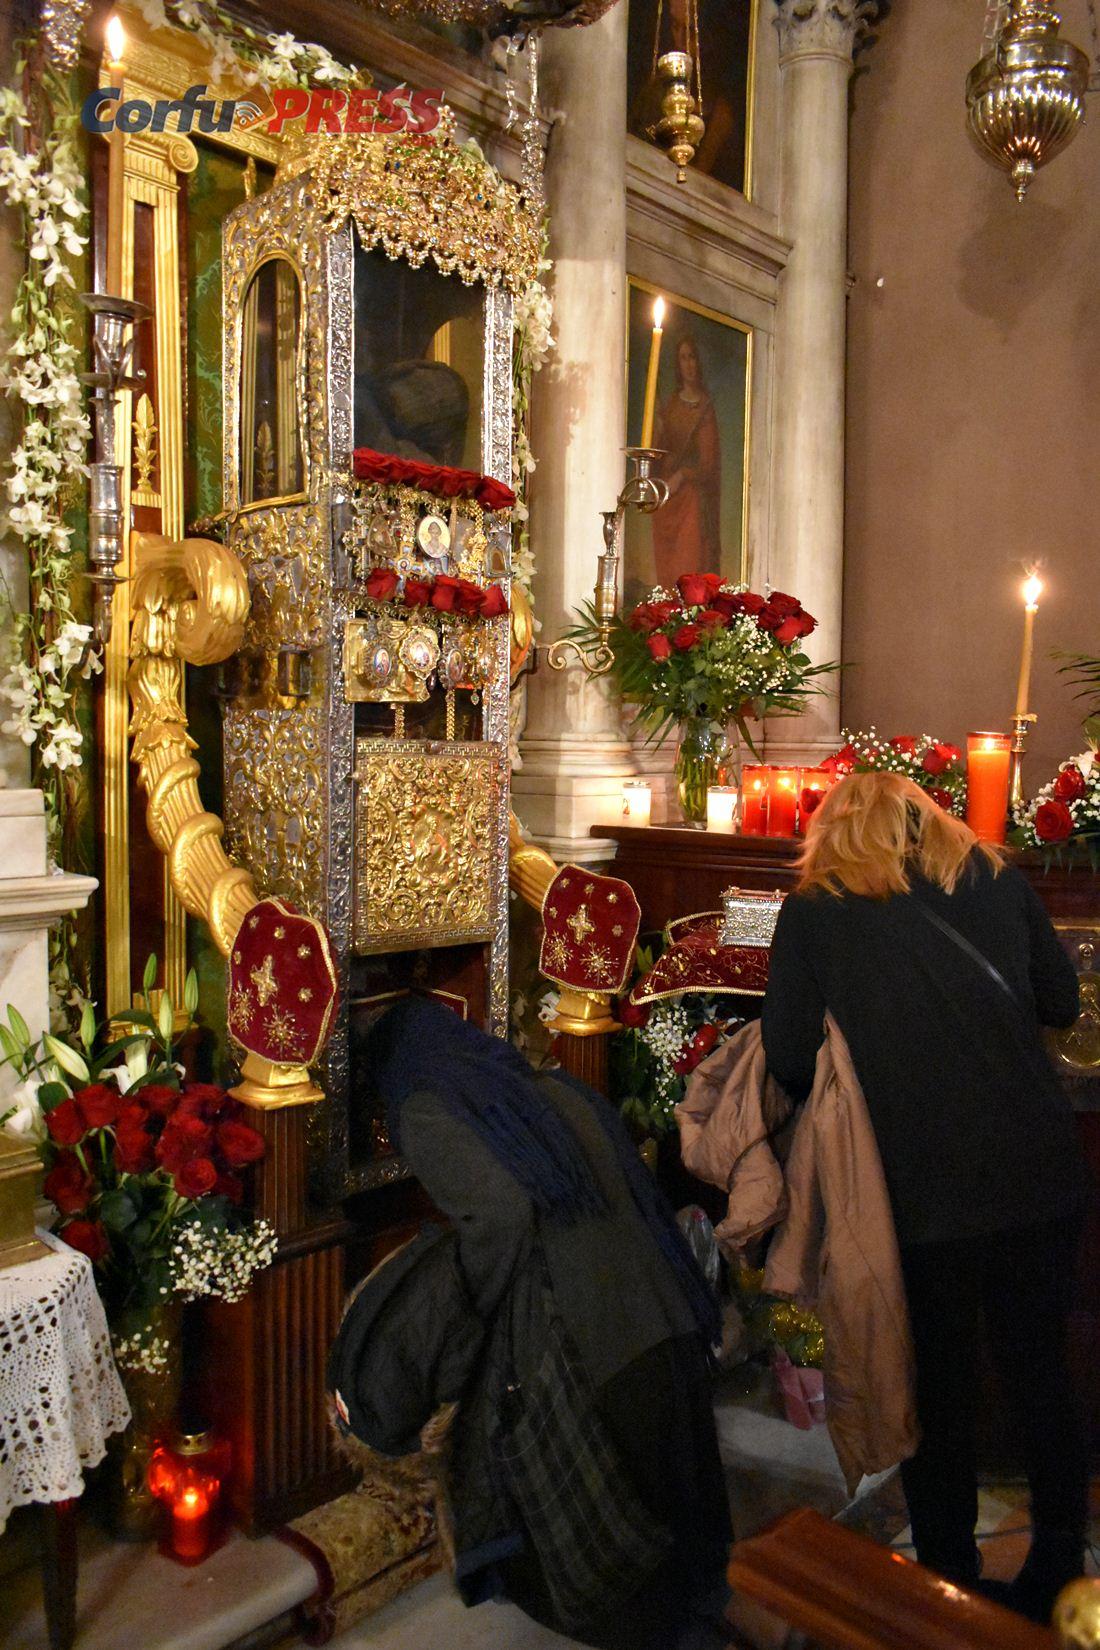 12-12-18–Eorti_Agiou_Spyridona_16